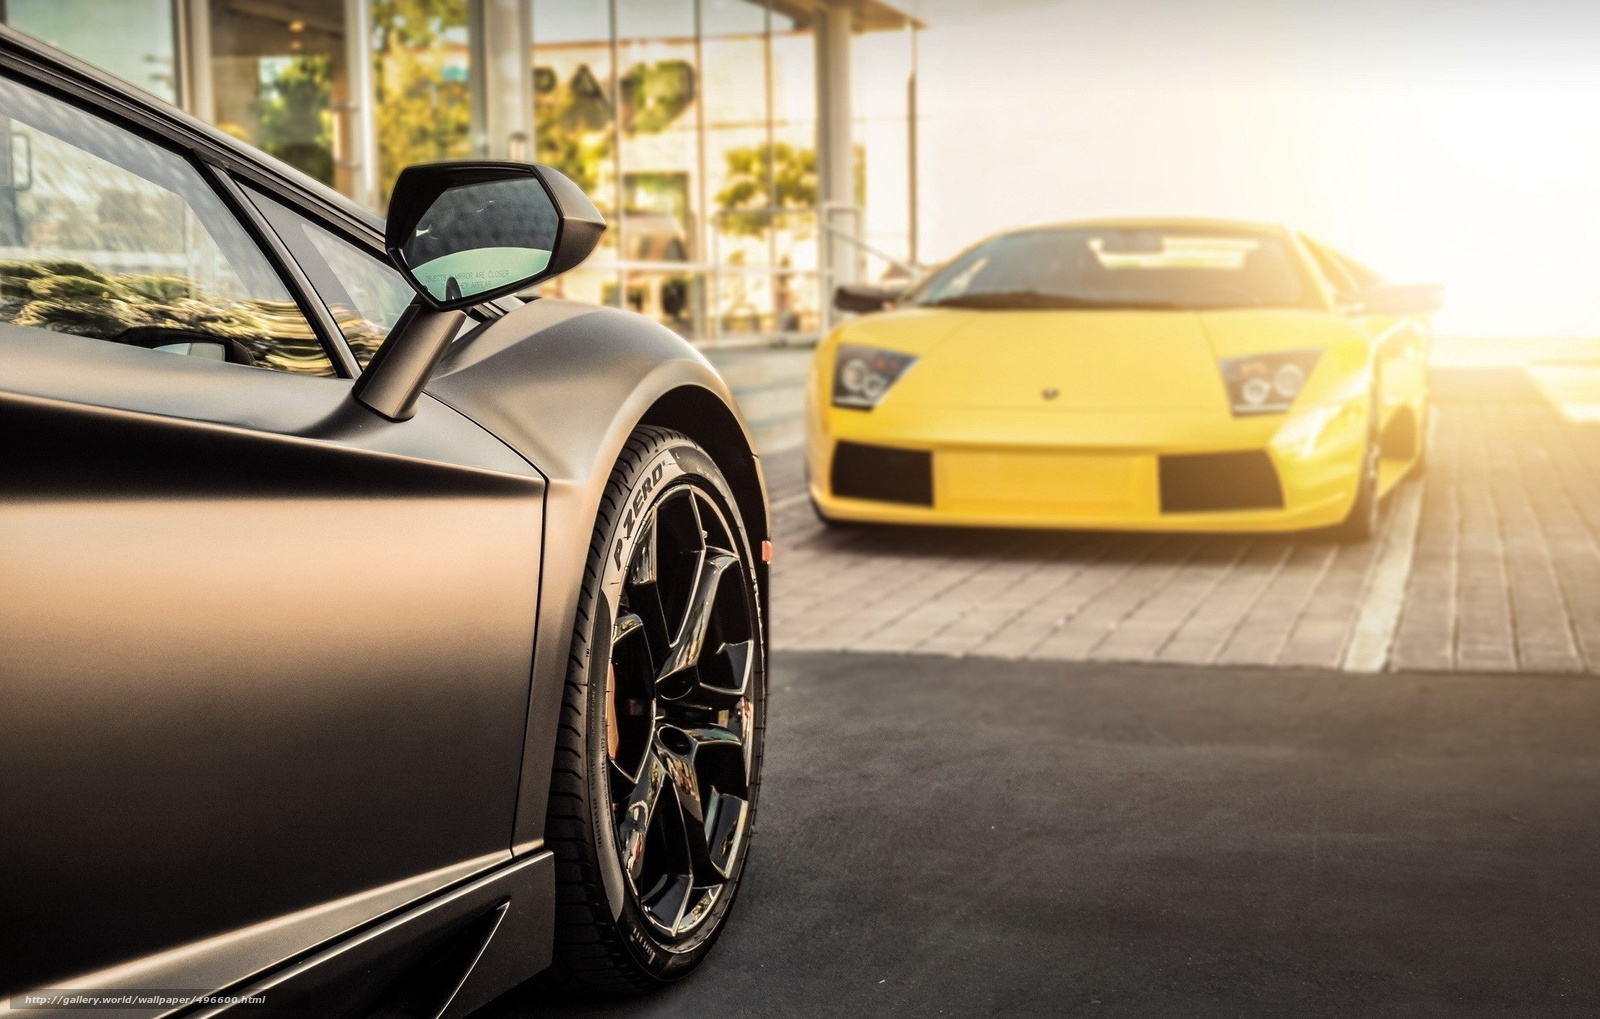 Descargar gratis Lamborghini,  Coche,  mquina,  coches Fondos de escritorio en la resolucin 2048x1304 — imagen №496600